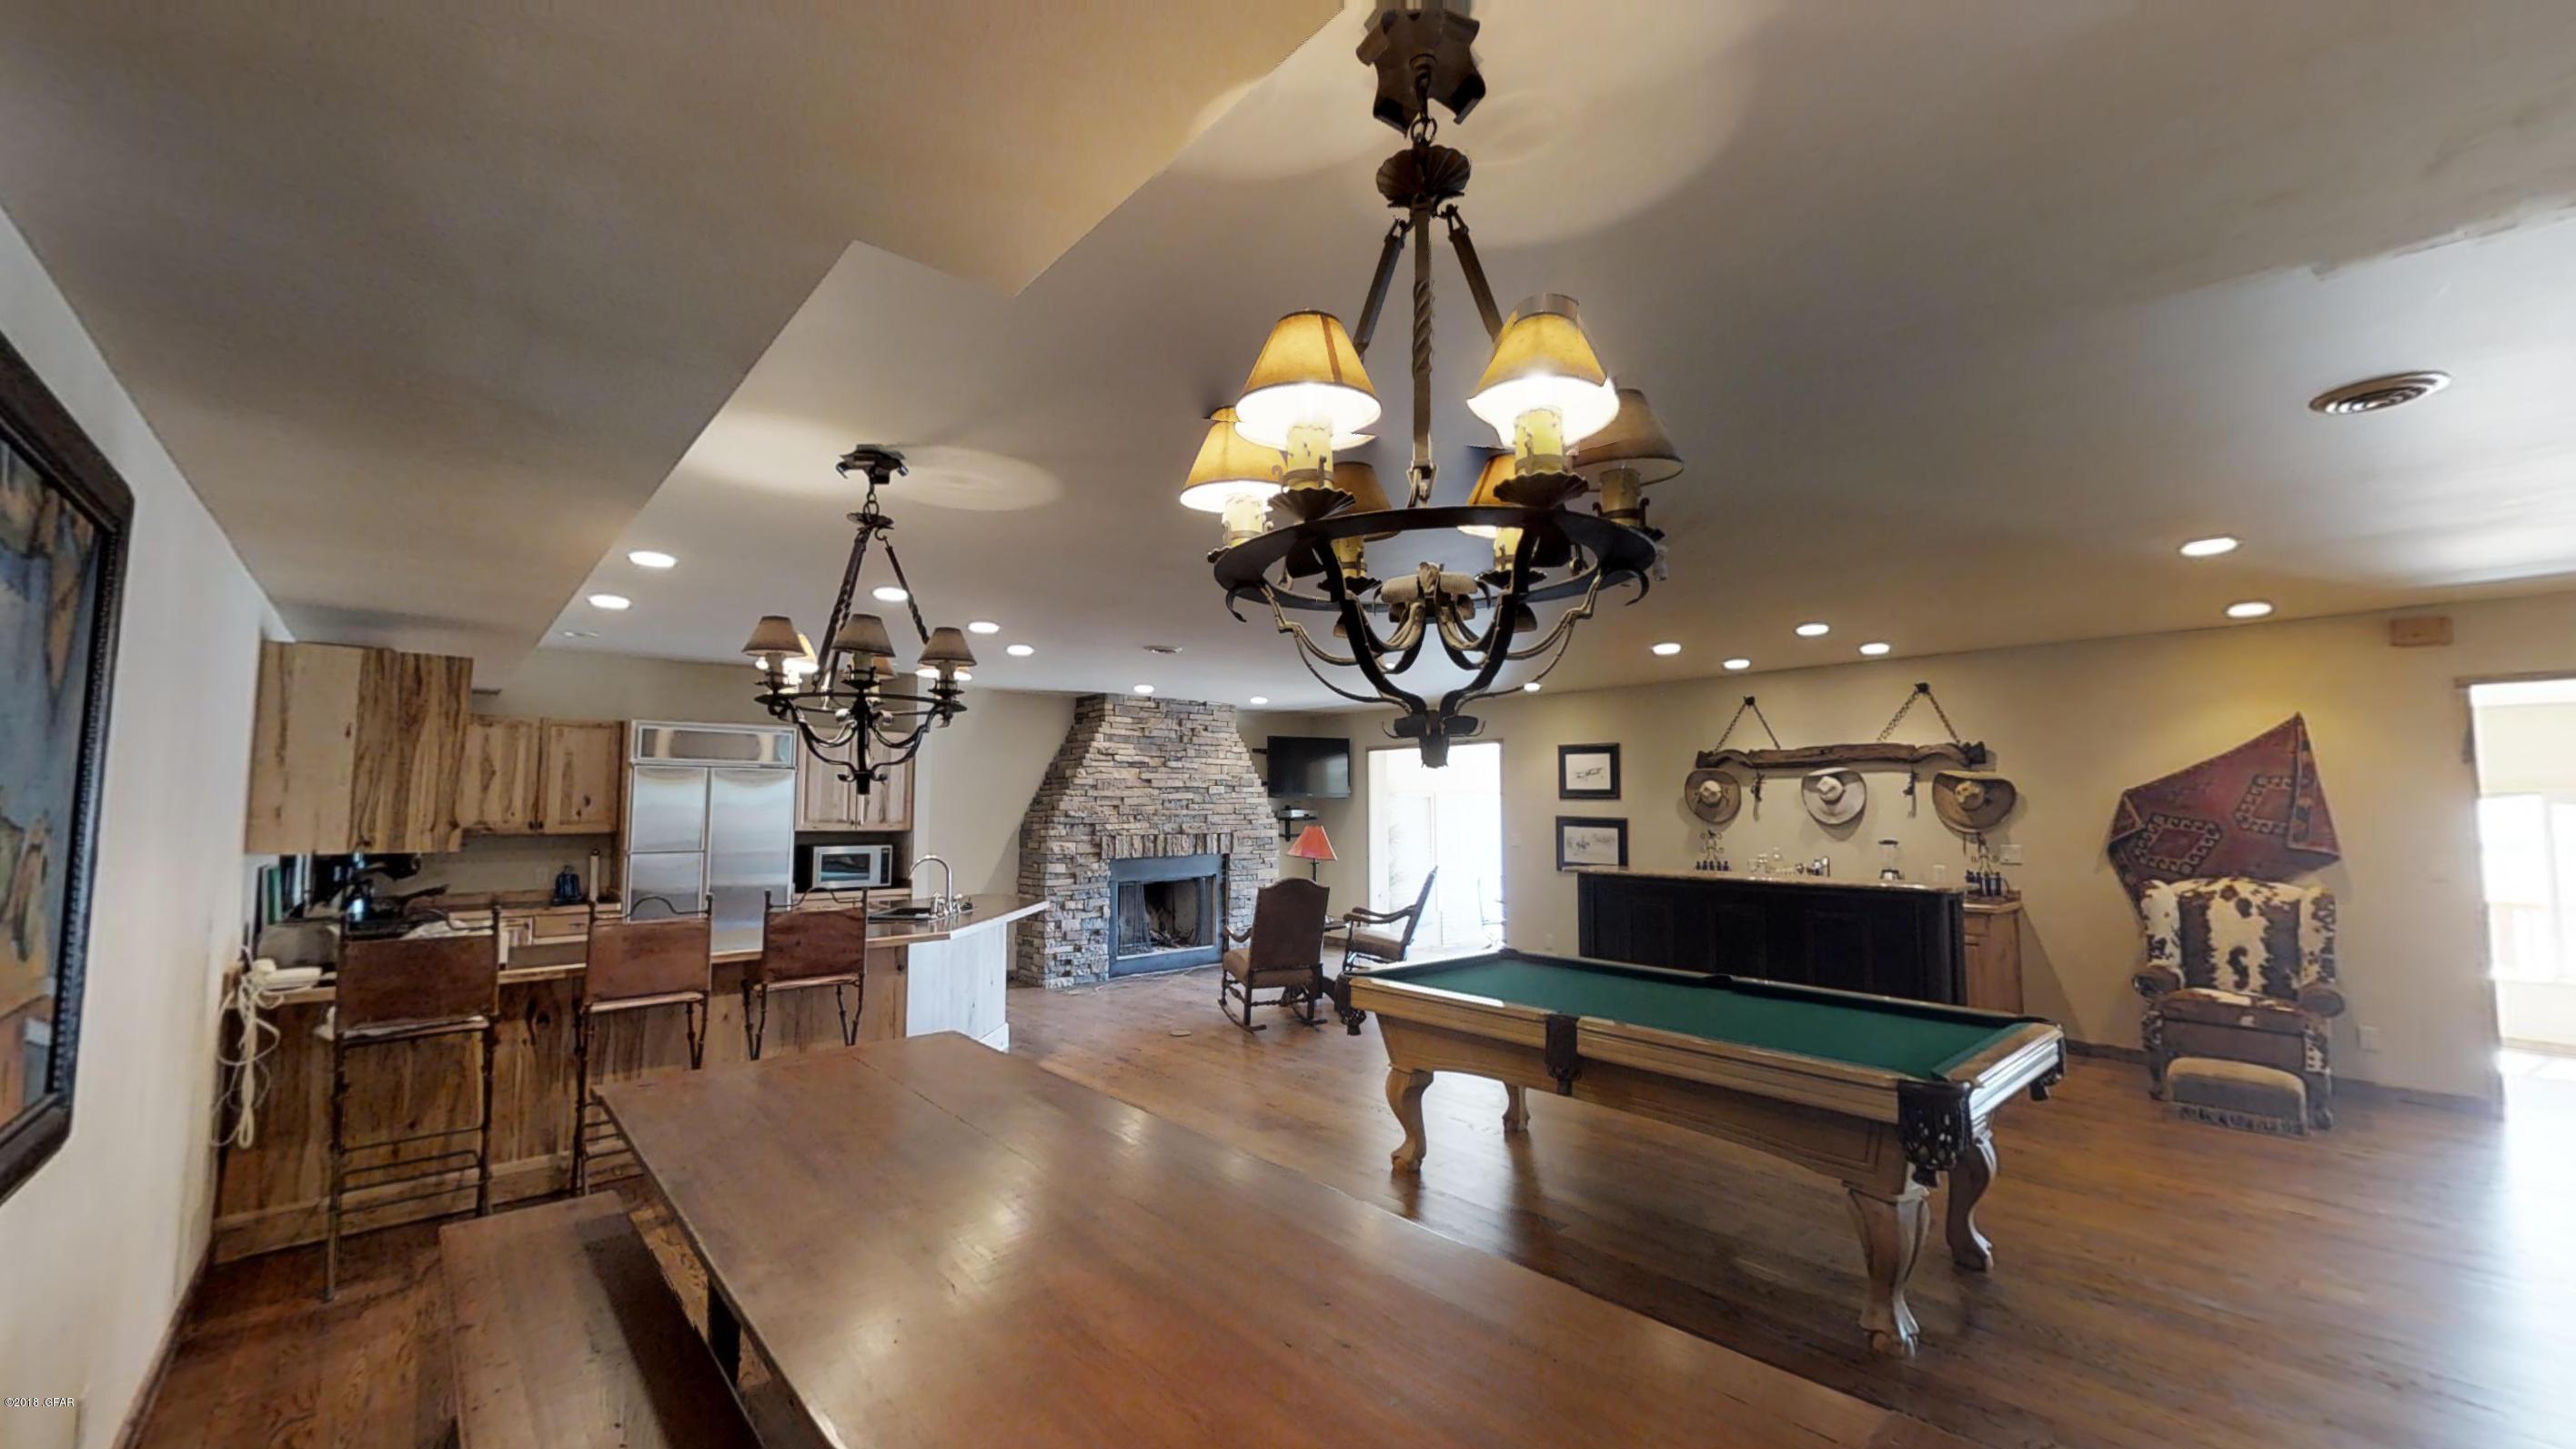 31 & 35 Scenic Valley Lane Cascade Montana 59421 Single Family Homes for  Sale